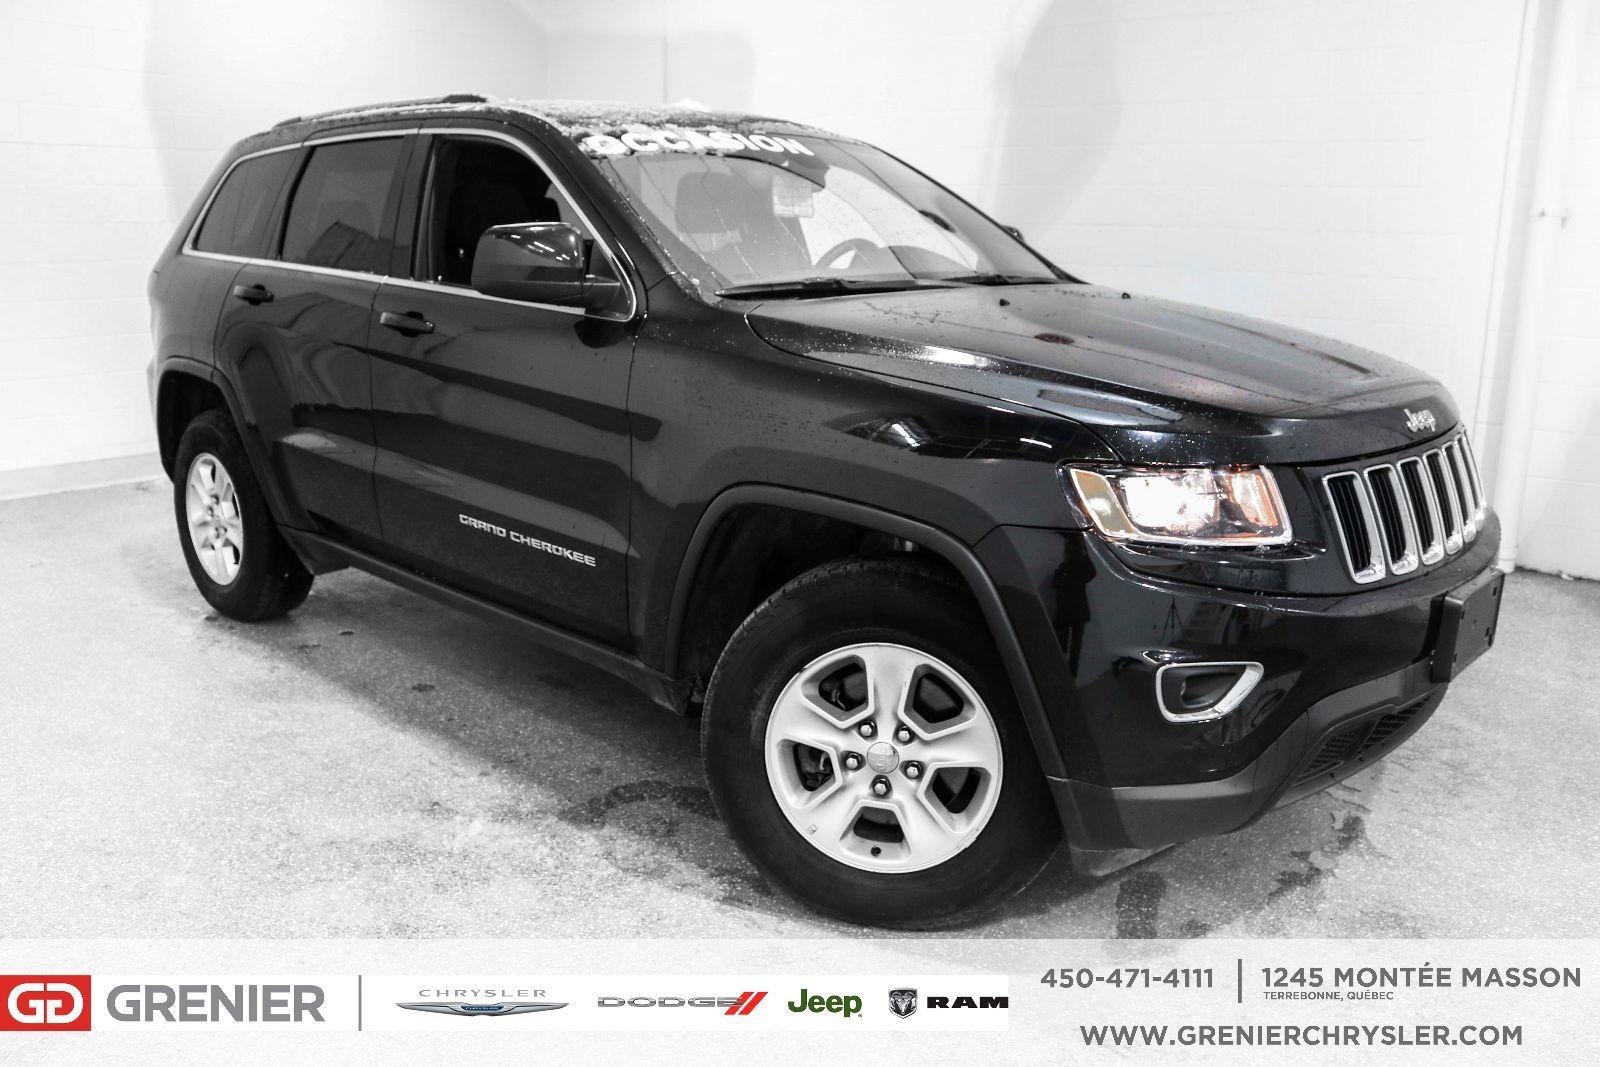 jeep grand cherokee bas km 4x4 v6 garantie 2016 noir 44 304 km 26477 0 grenier chrysler. Black Bedroom Furniture Sets. Home Design Ideas